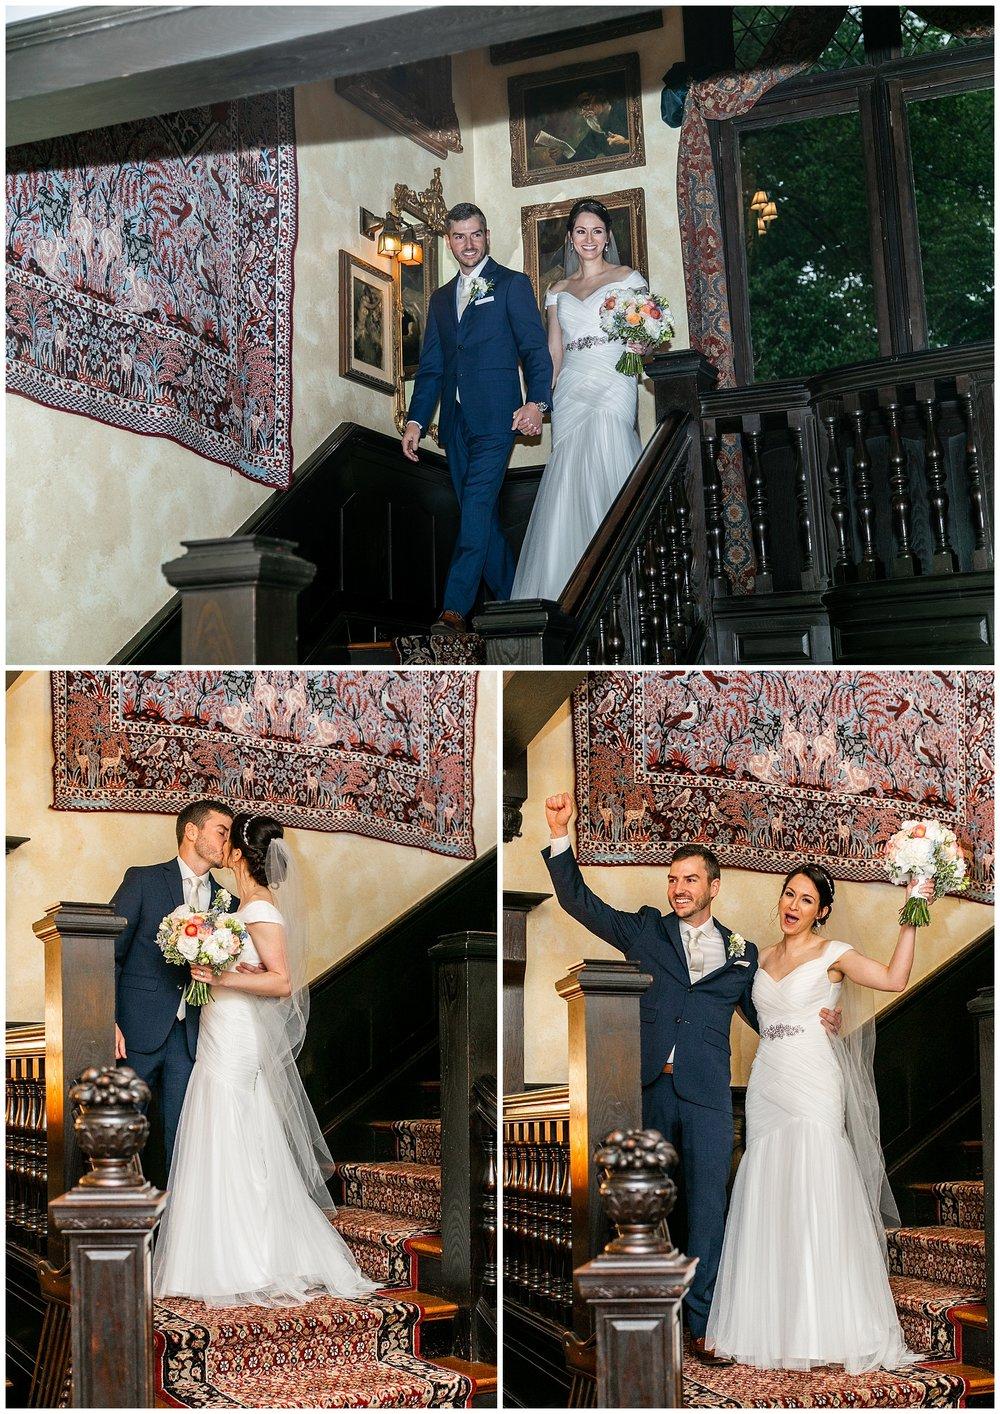 Ashley + Kevin Gramercy Mansion Rainy Day Baltimore Wedding Living Radiant Photography photos_0090.jpg